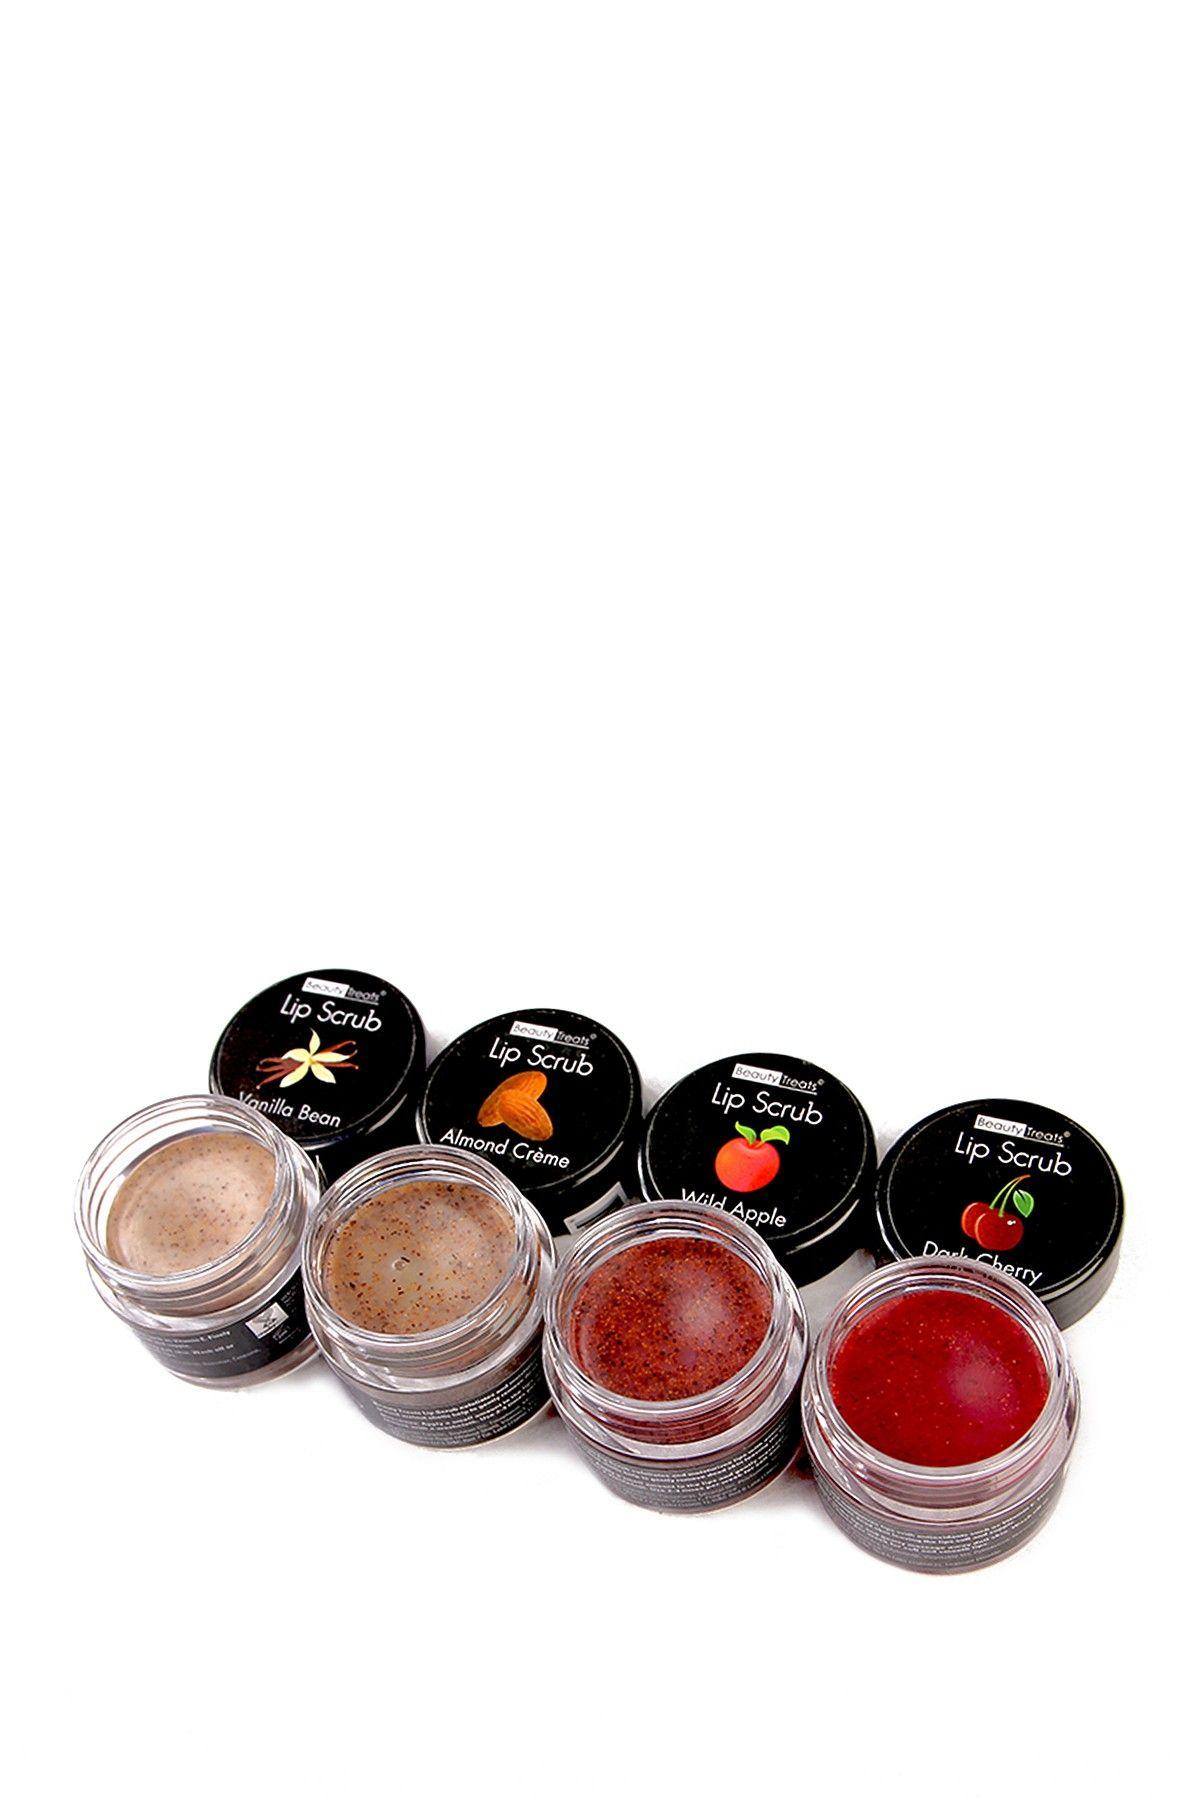 Beauty Treats Lip Scrub Set Of 4 Nordstrom Rack Lip Scrub Beauty Treats Lip Moisturizer